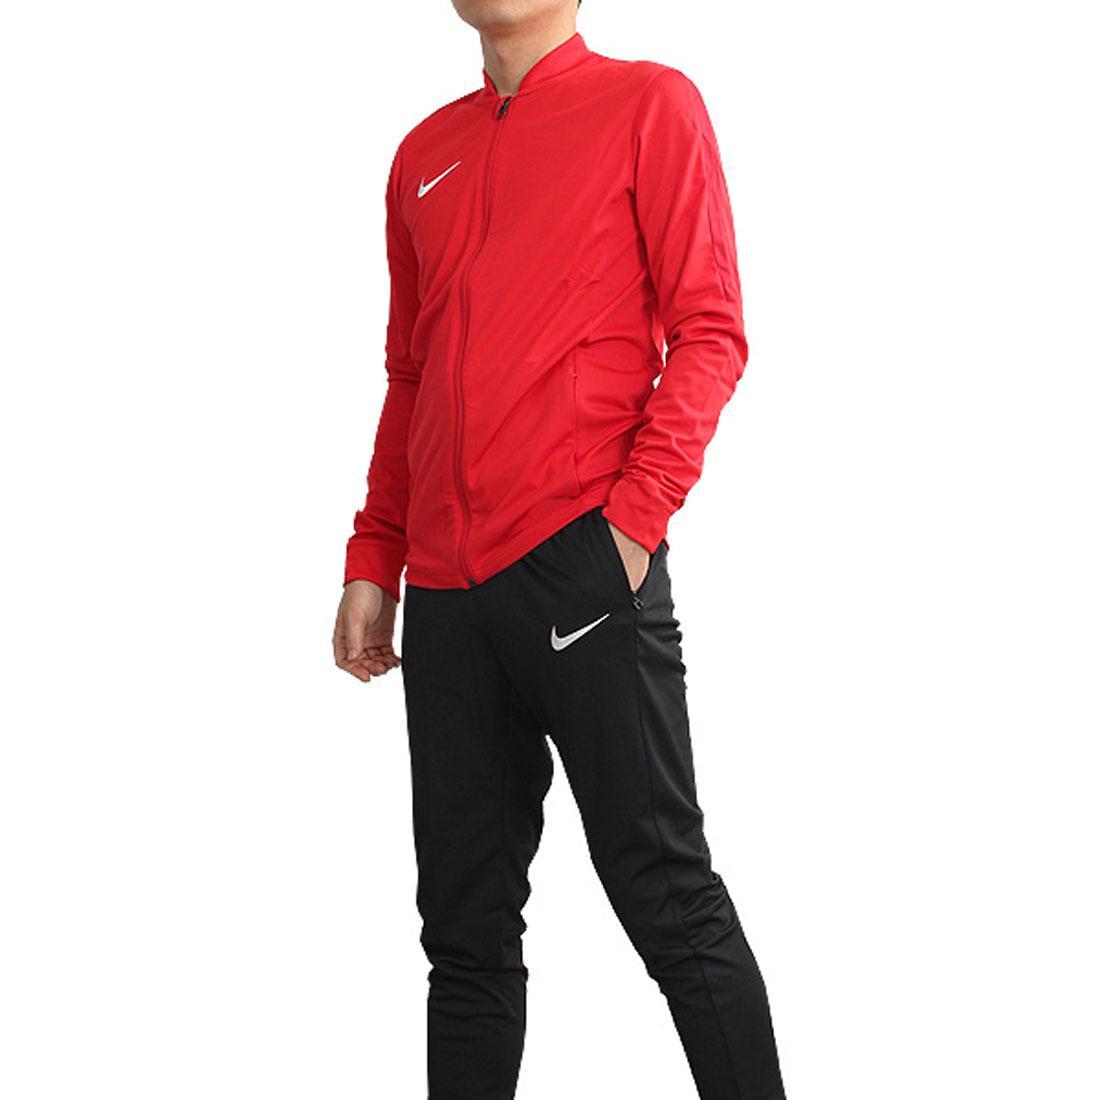 Nike Mens Academy 16 Dri Fit Red Black Football Gym Warm Up Full Tracksuit a7234f6e5f4f